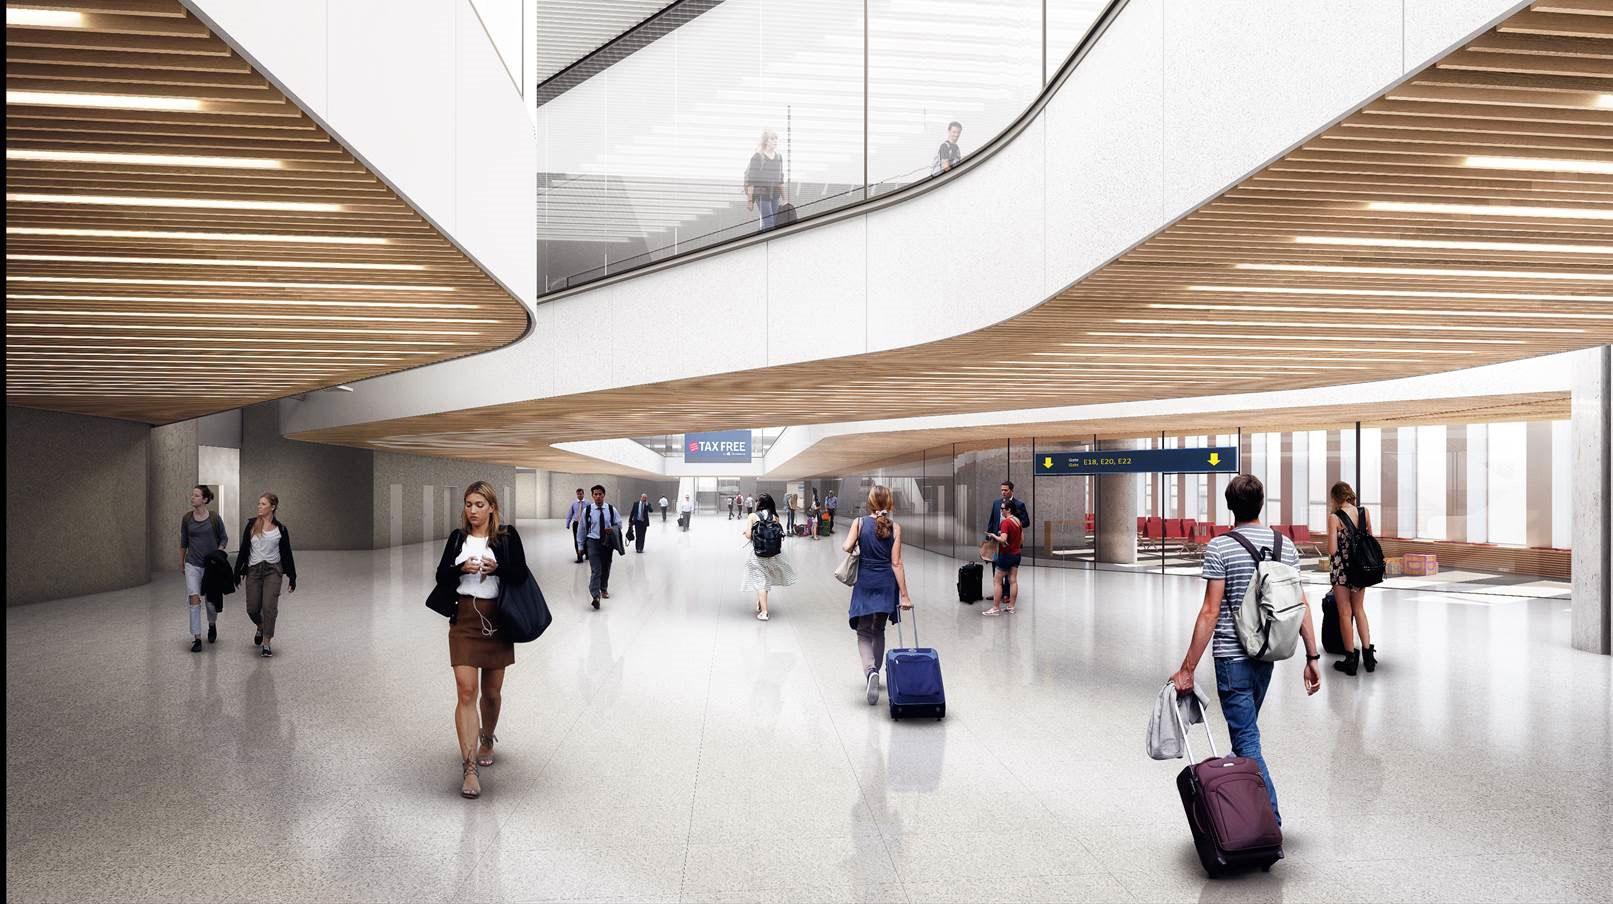 ZESO 航空规划 / 哥本哈根机场 Finger E 新航站楼